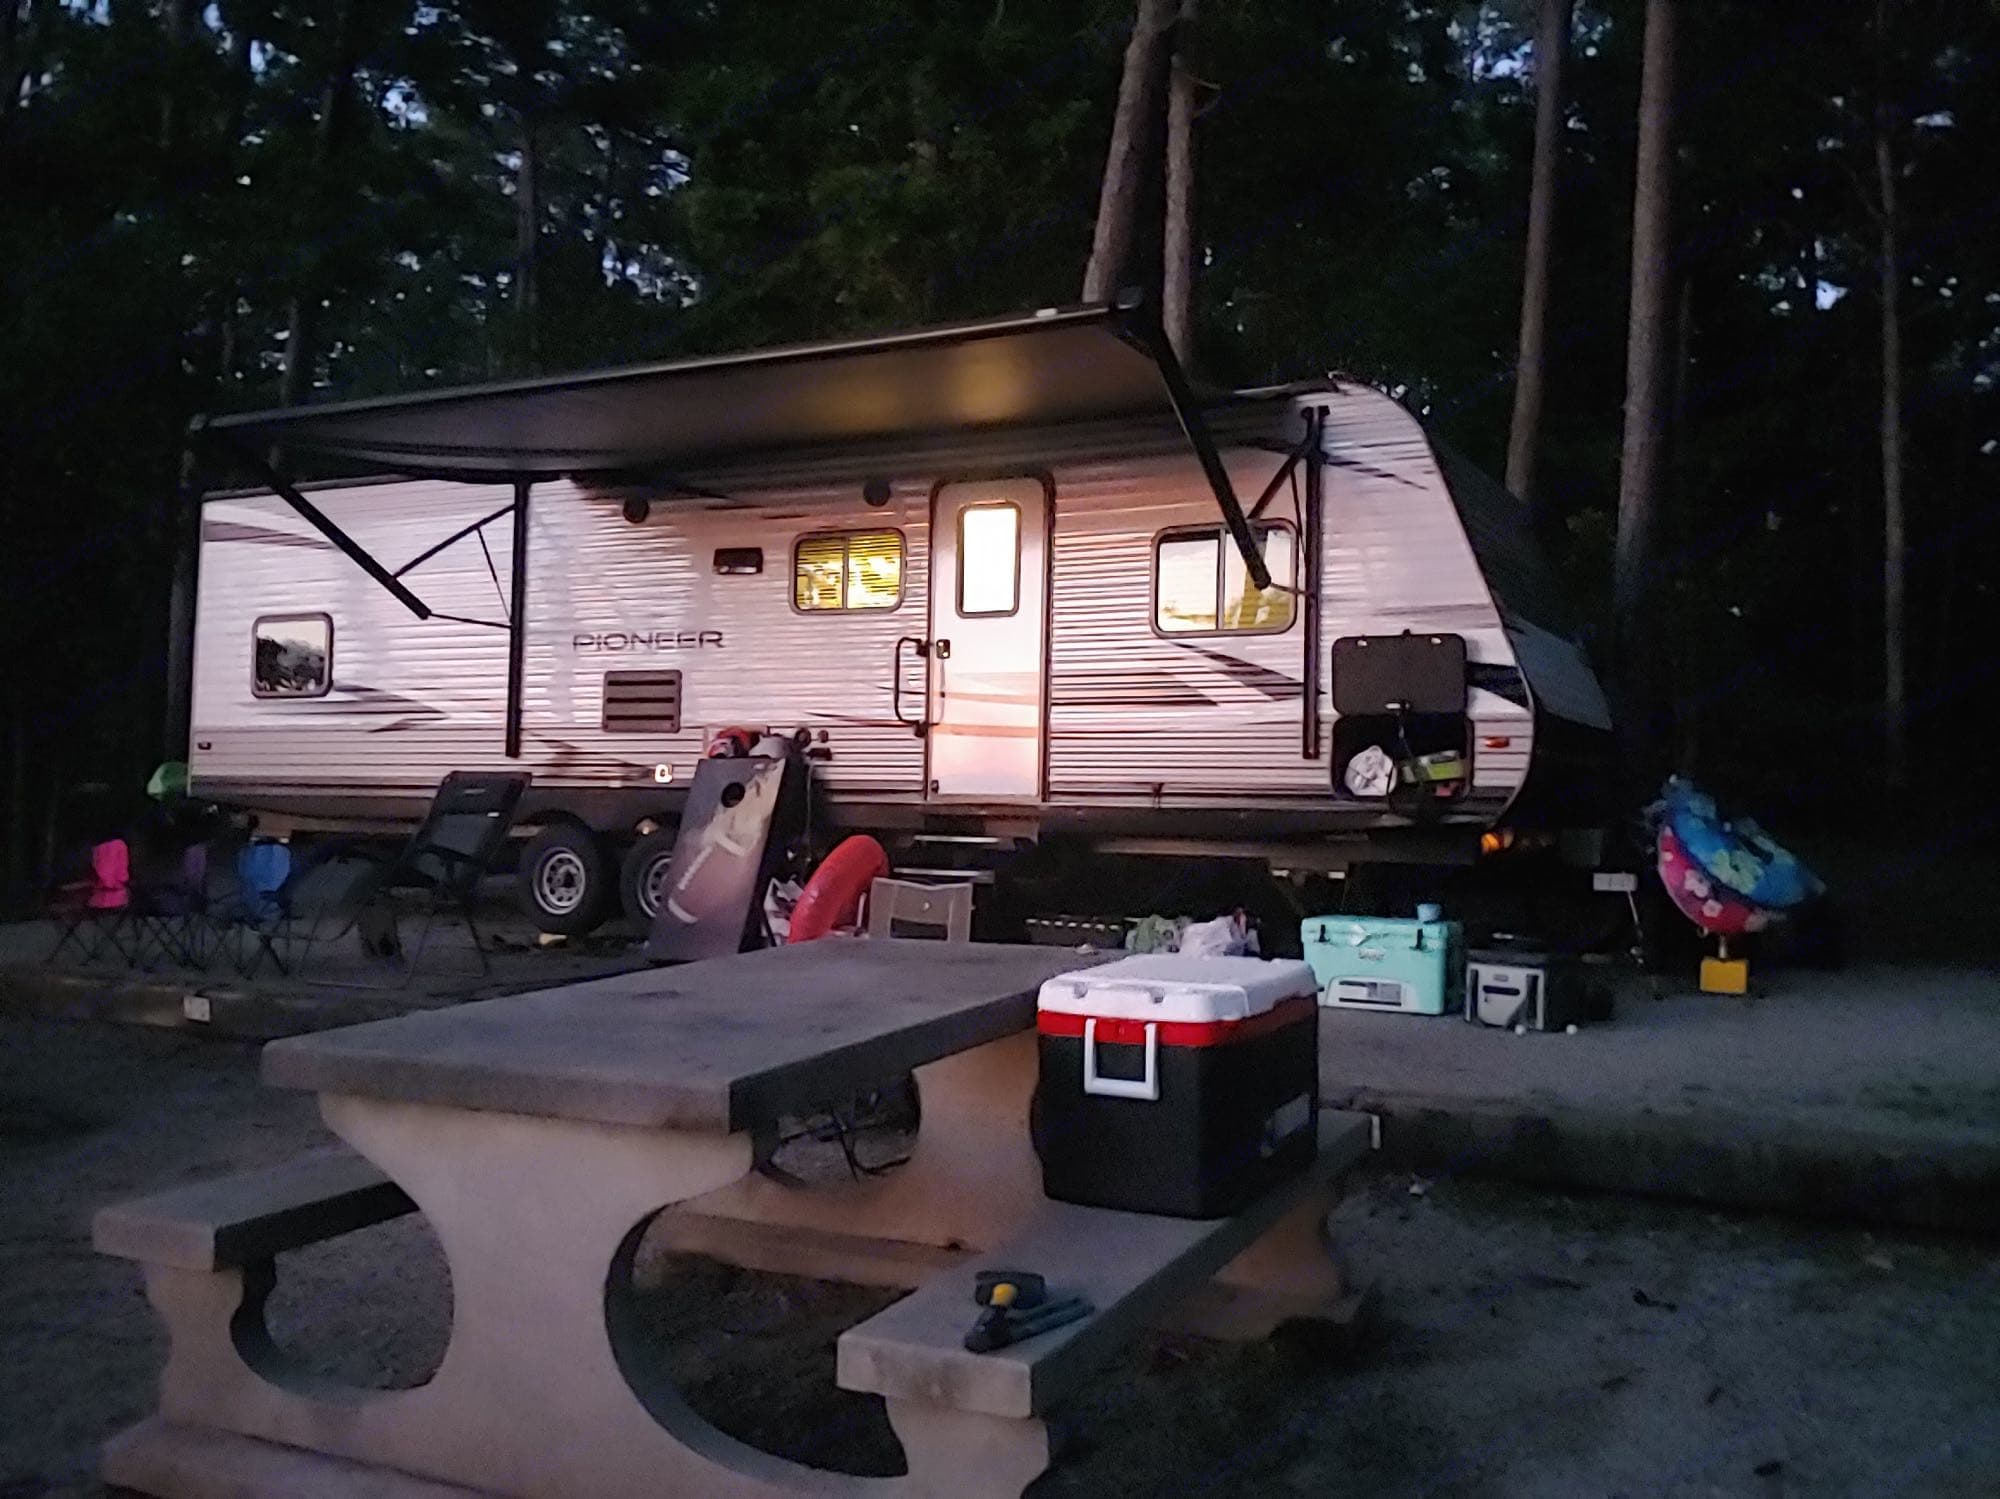 Camping at Mistletoe State Park in Appling, GA on Lake Thurmond.. Heartland Pioneer 2019